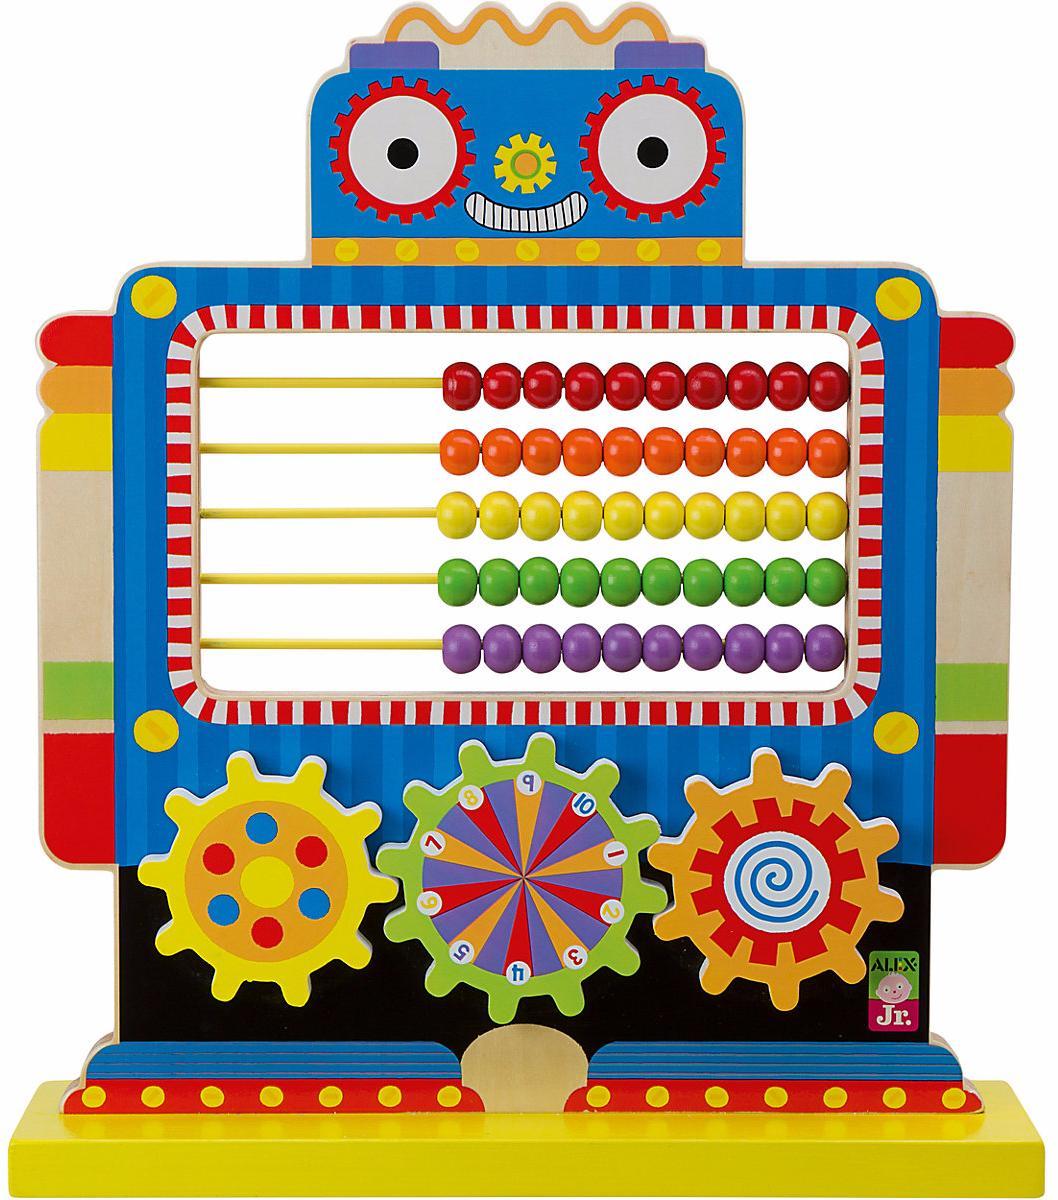 Alex Toys Робот (1999R) - развивающая игрушка (Multicolor)Развивающие игрушки<br>Развивающая игрушка<br>